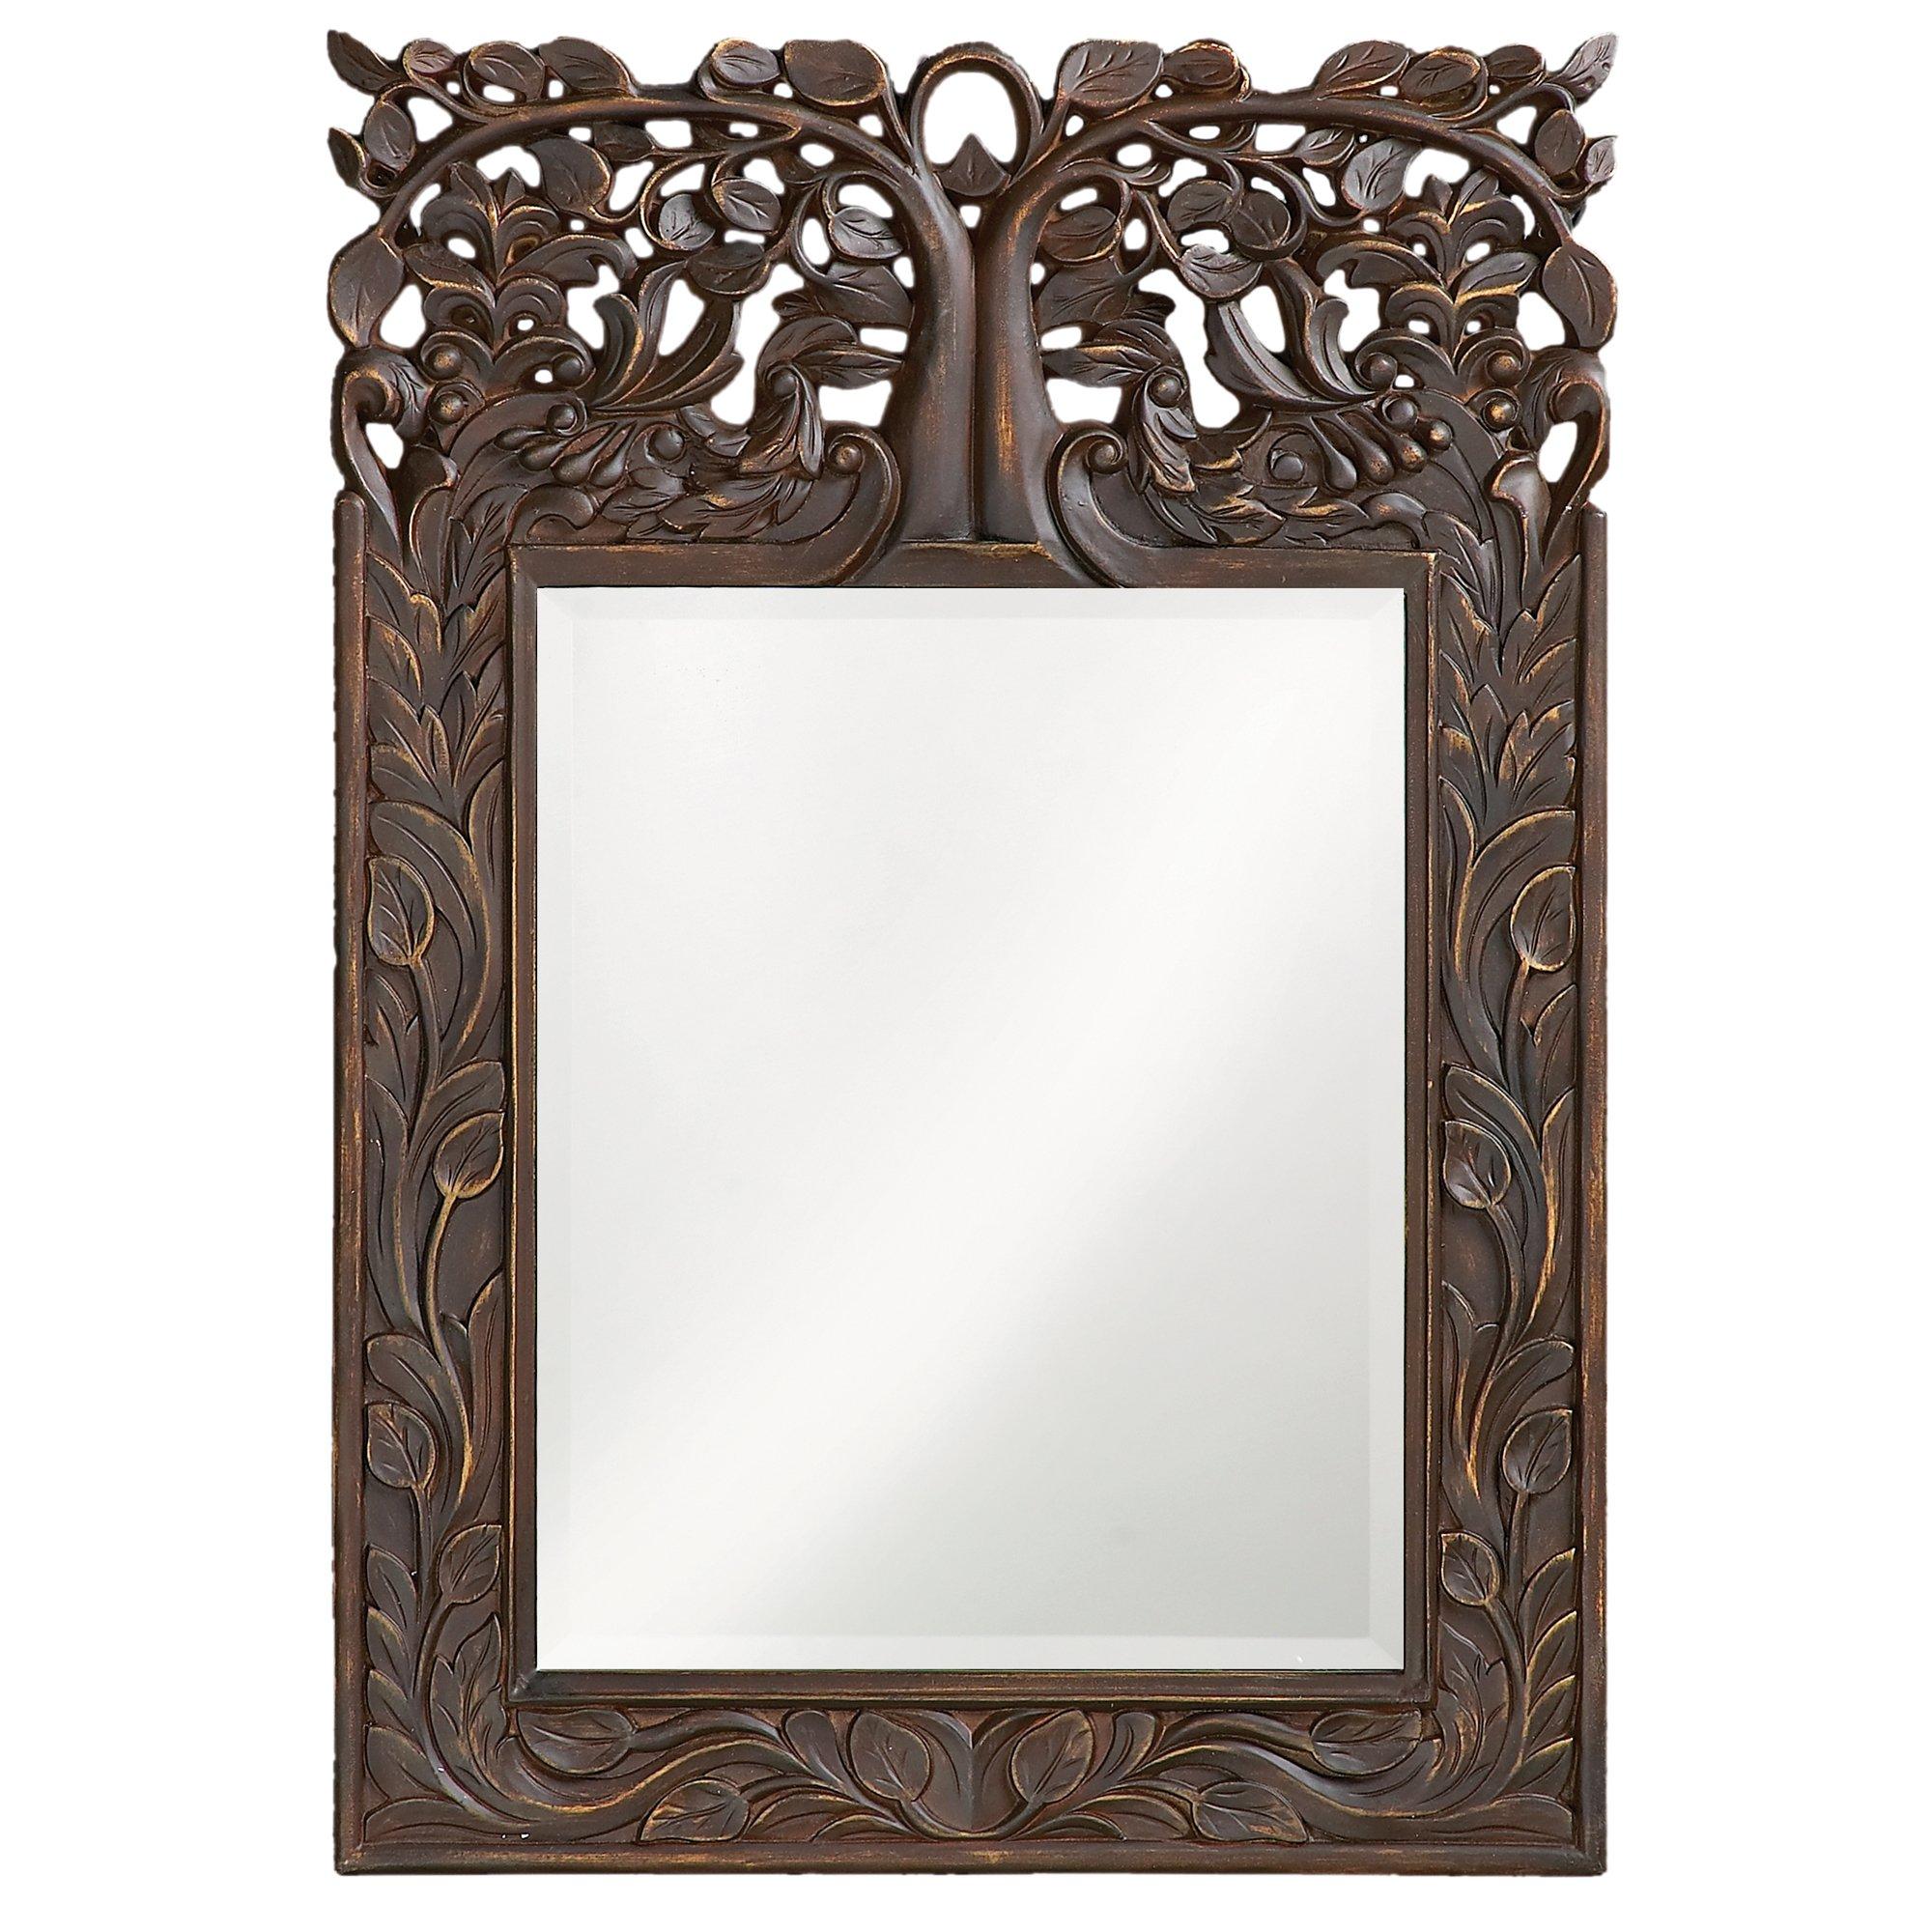 Howard Elliott 4084 Oakvale Mirror, French Brown